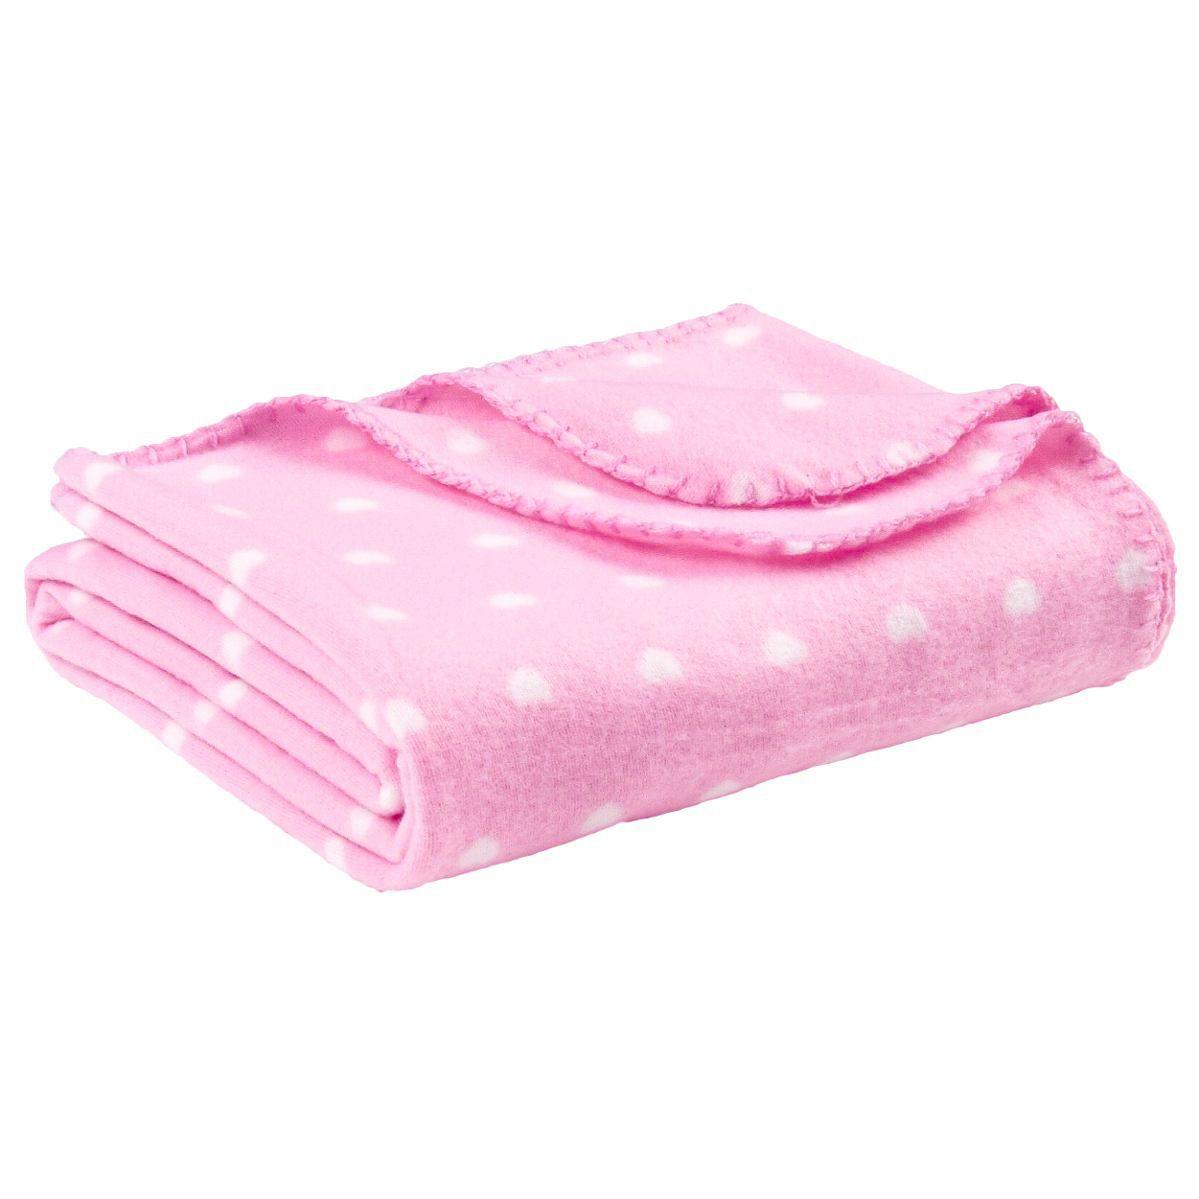 plaid polaire 150 cm coeur rose p le plaid cocooning. Black Bedroom Furniture Sets. Home Design Ideas